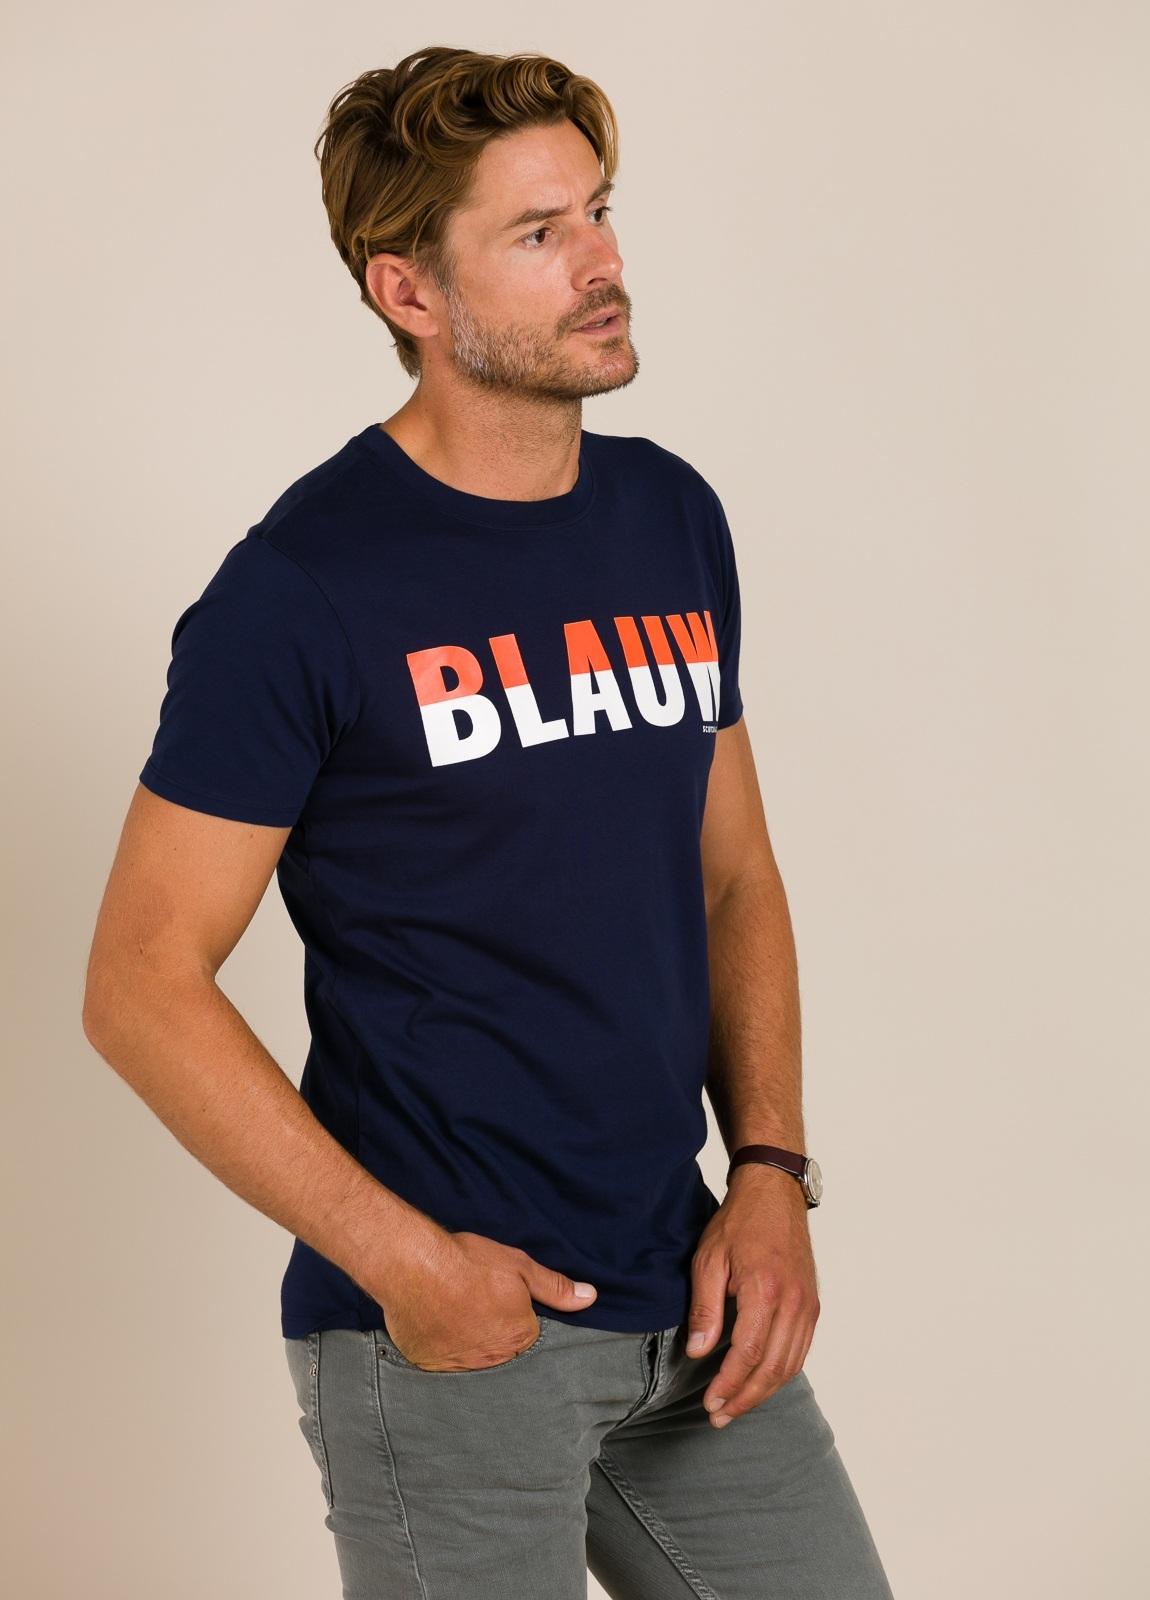 Camiseta SCOTCH & SODA azul marino - Ítem3